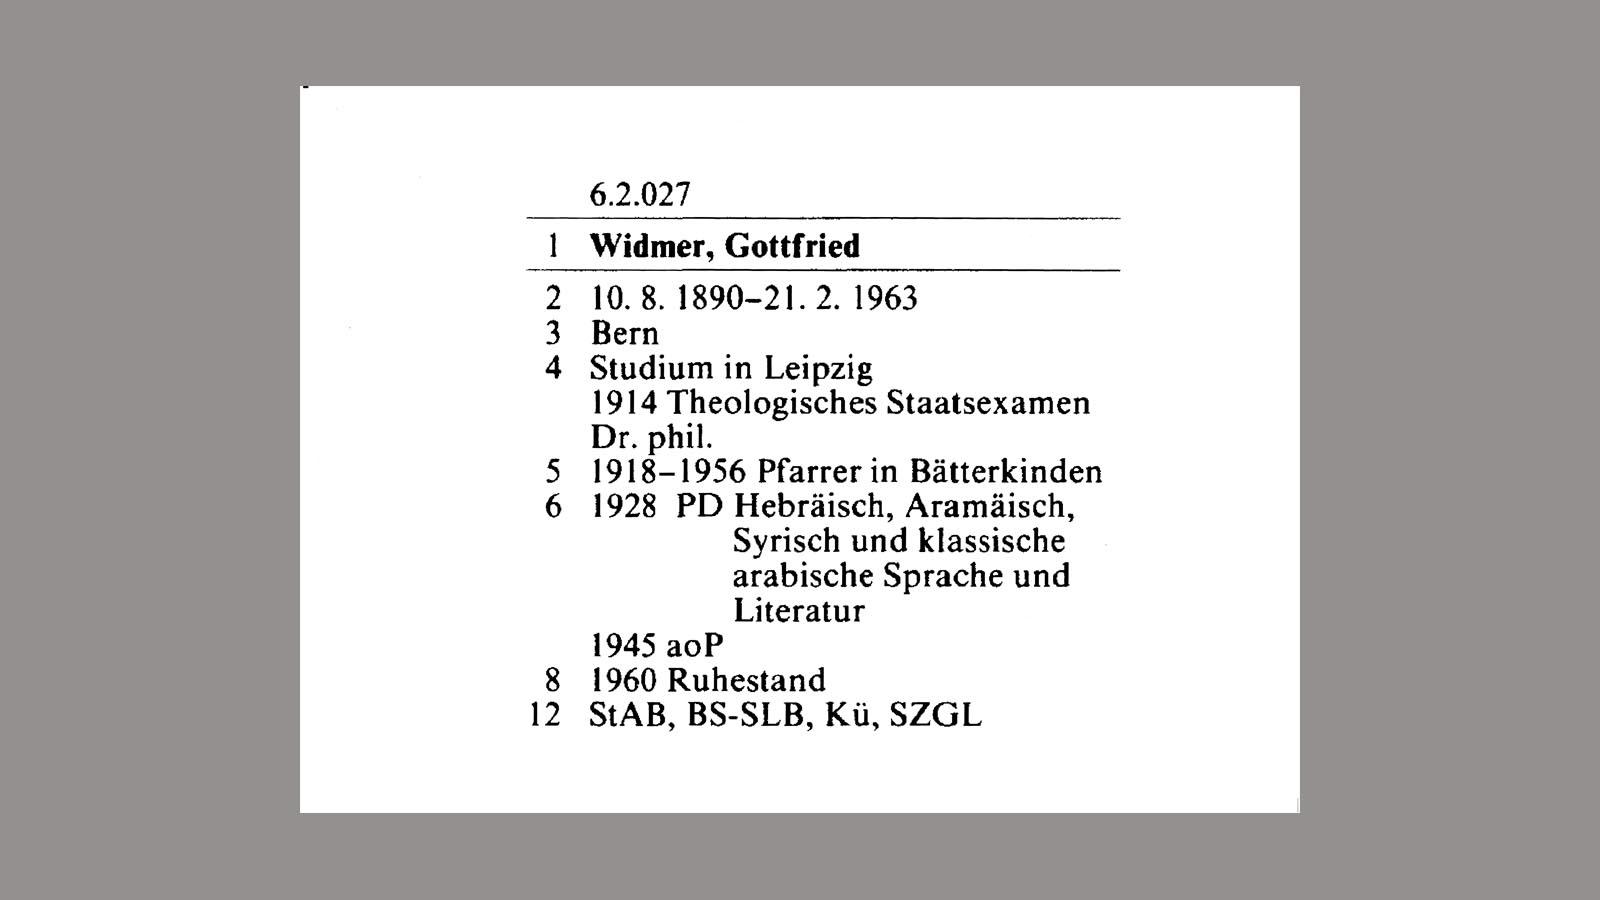 cv-gottfried-widmer-uni-bern.jpg